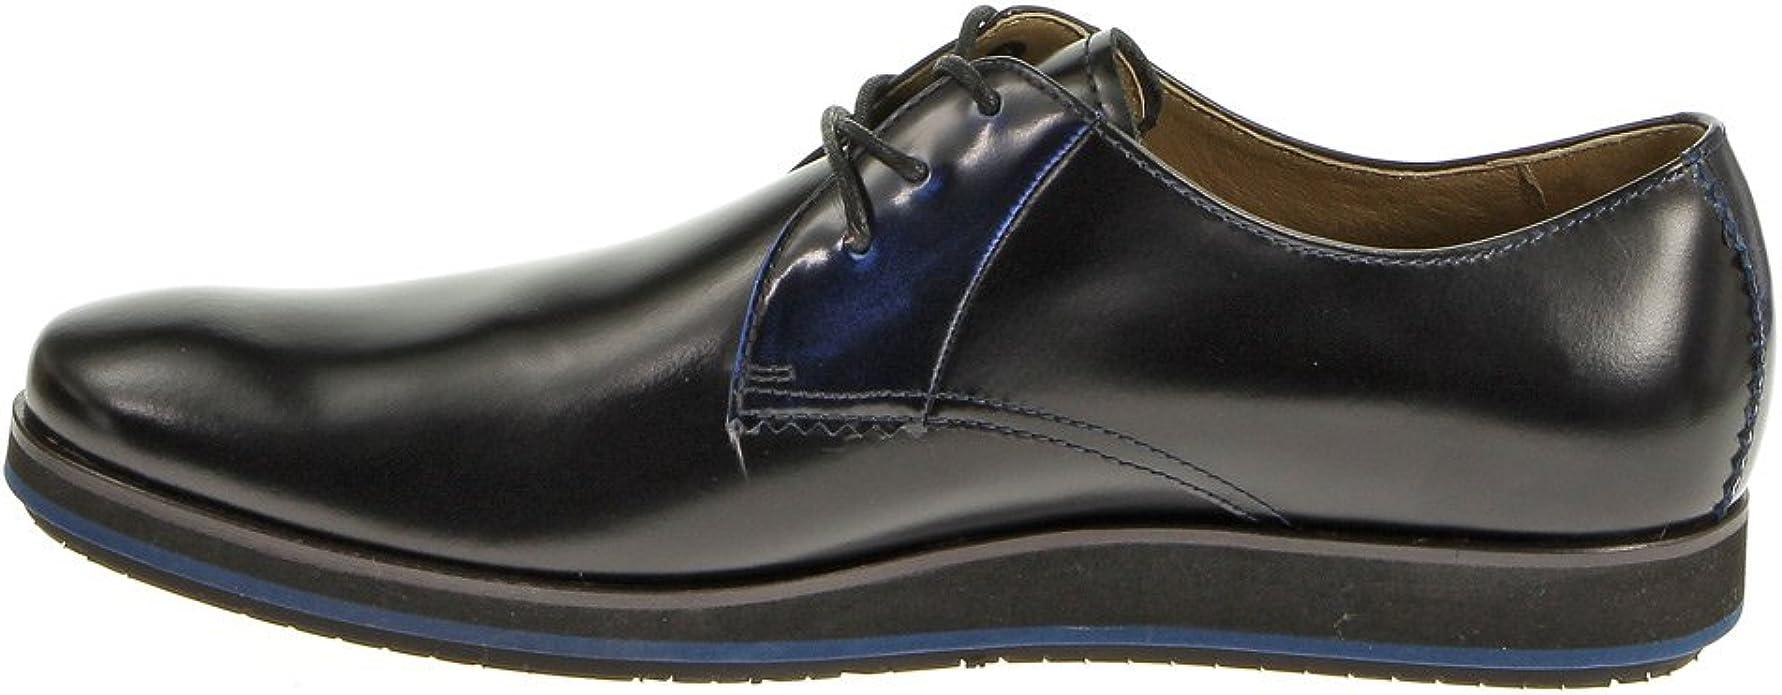 Hush Puppies Men/'s Halo Oxford Plain Toe Black Leather Oxford